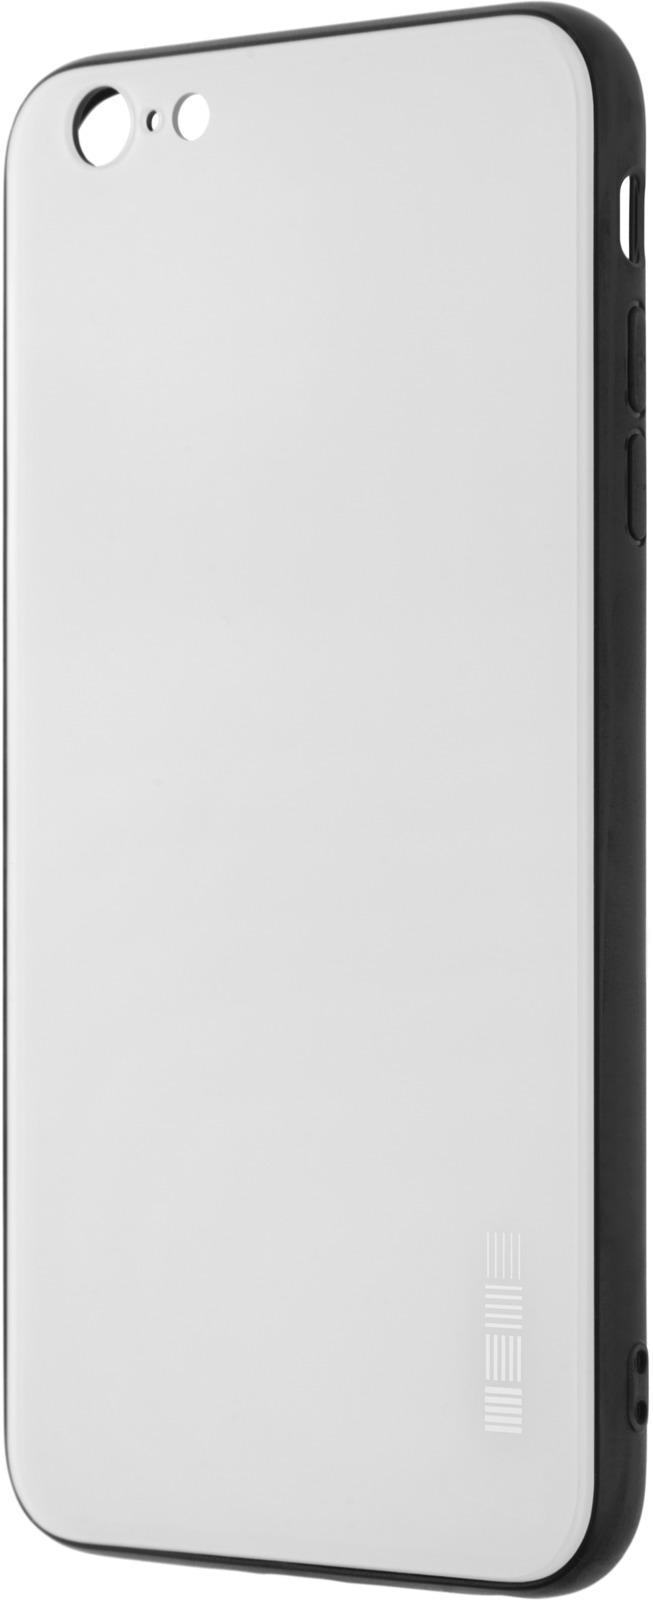 Чехол-накладка Interstep Is Glass для Apple iPhone 6/6S Plus, White чехол накладка interstep is glass для apple iphone x red